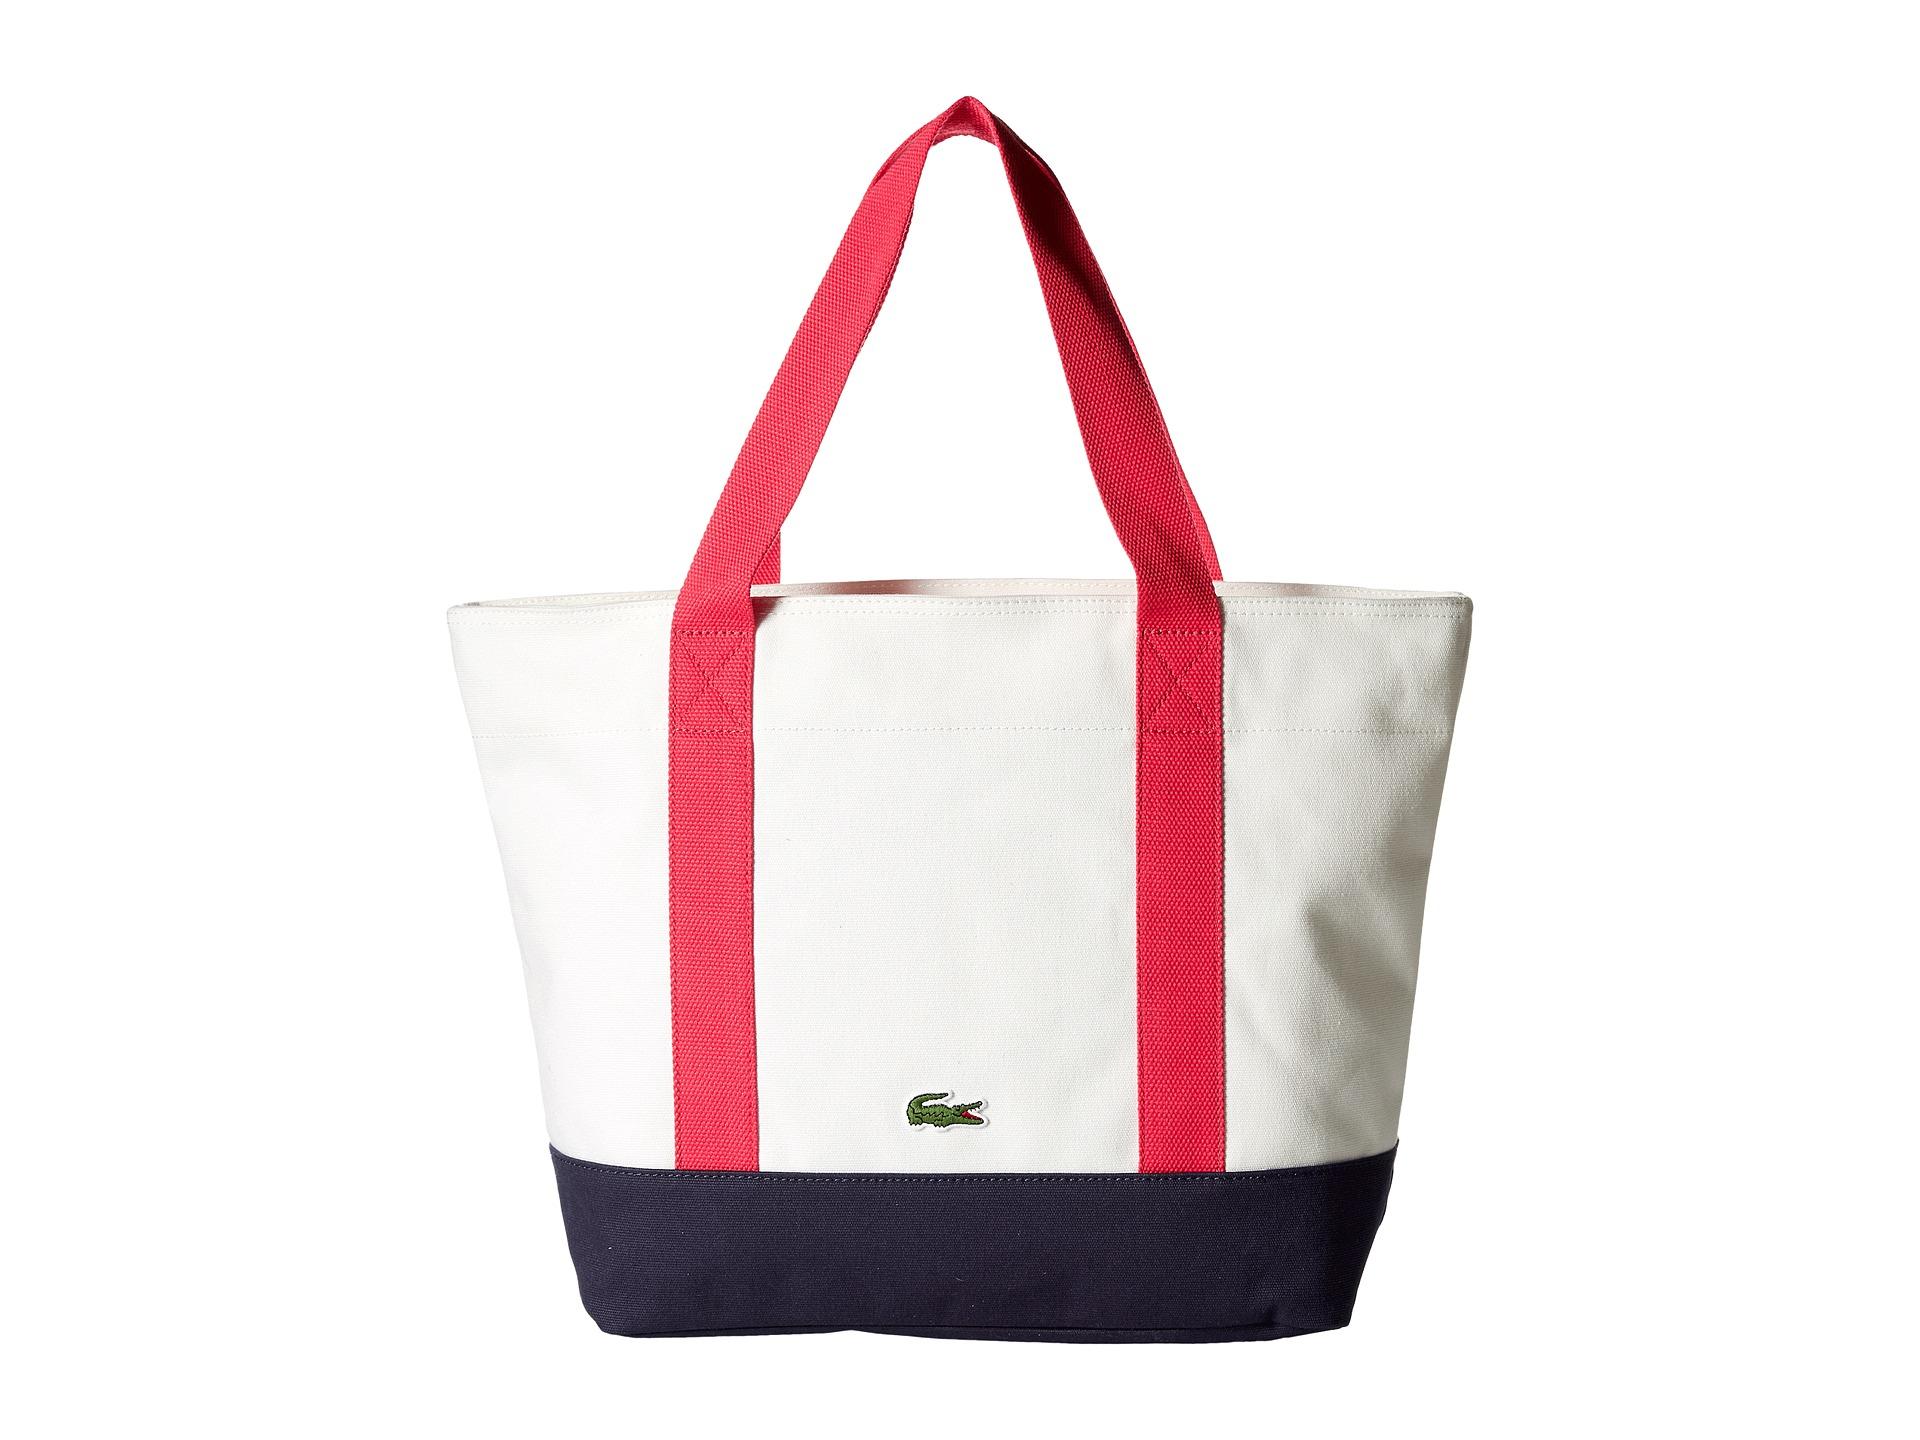 39d5b160fa3176 Lyst - Lacoste Medium Shopping Bag in White